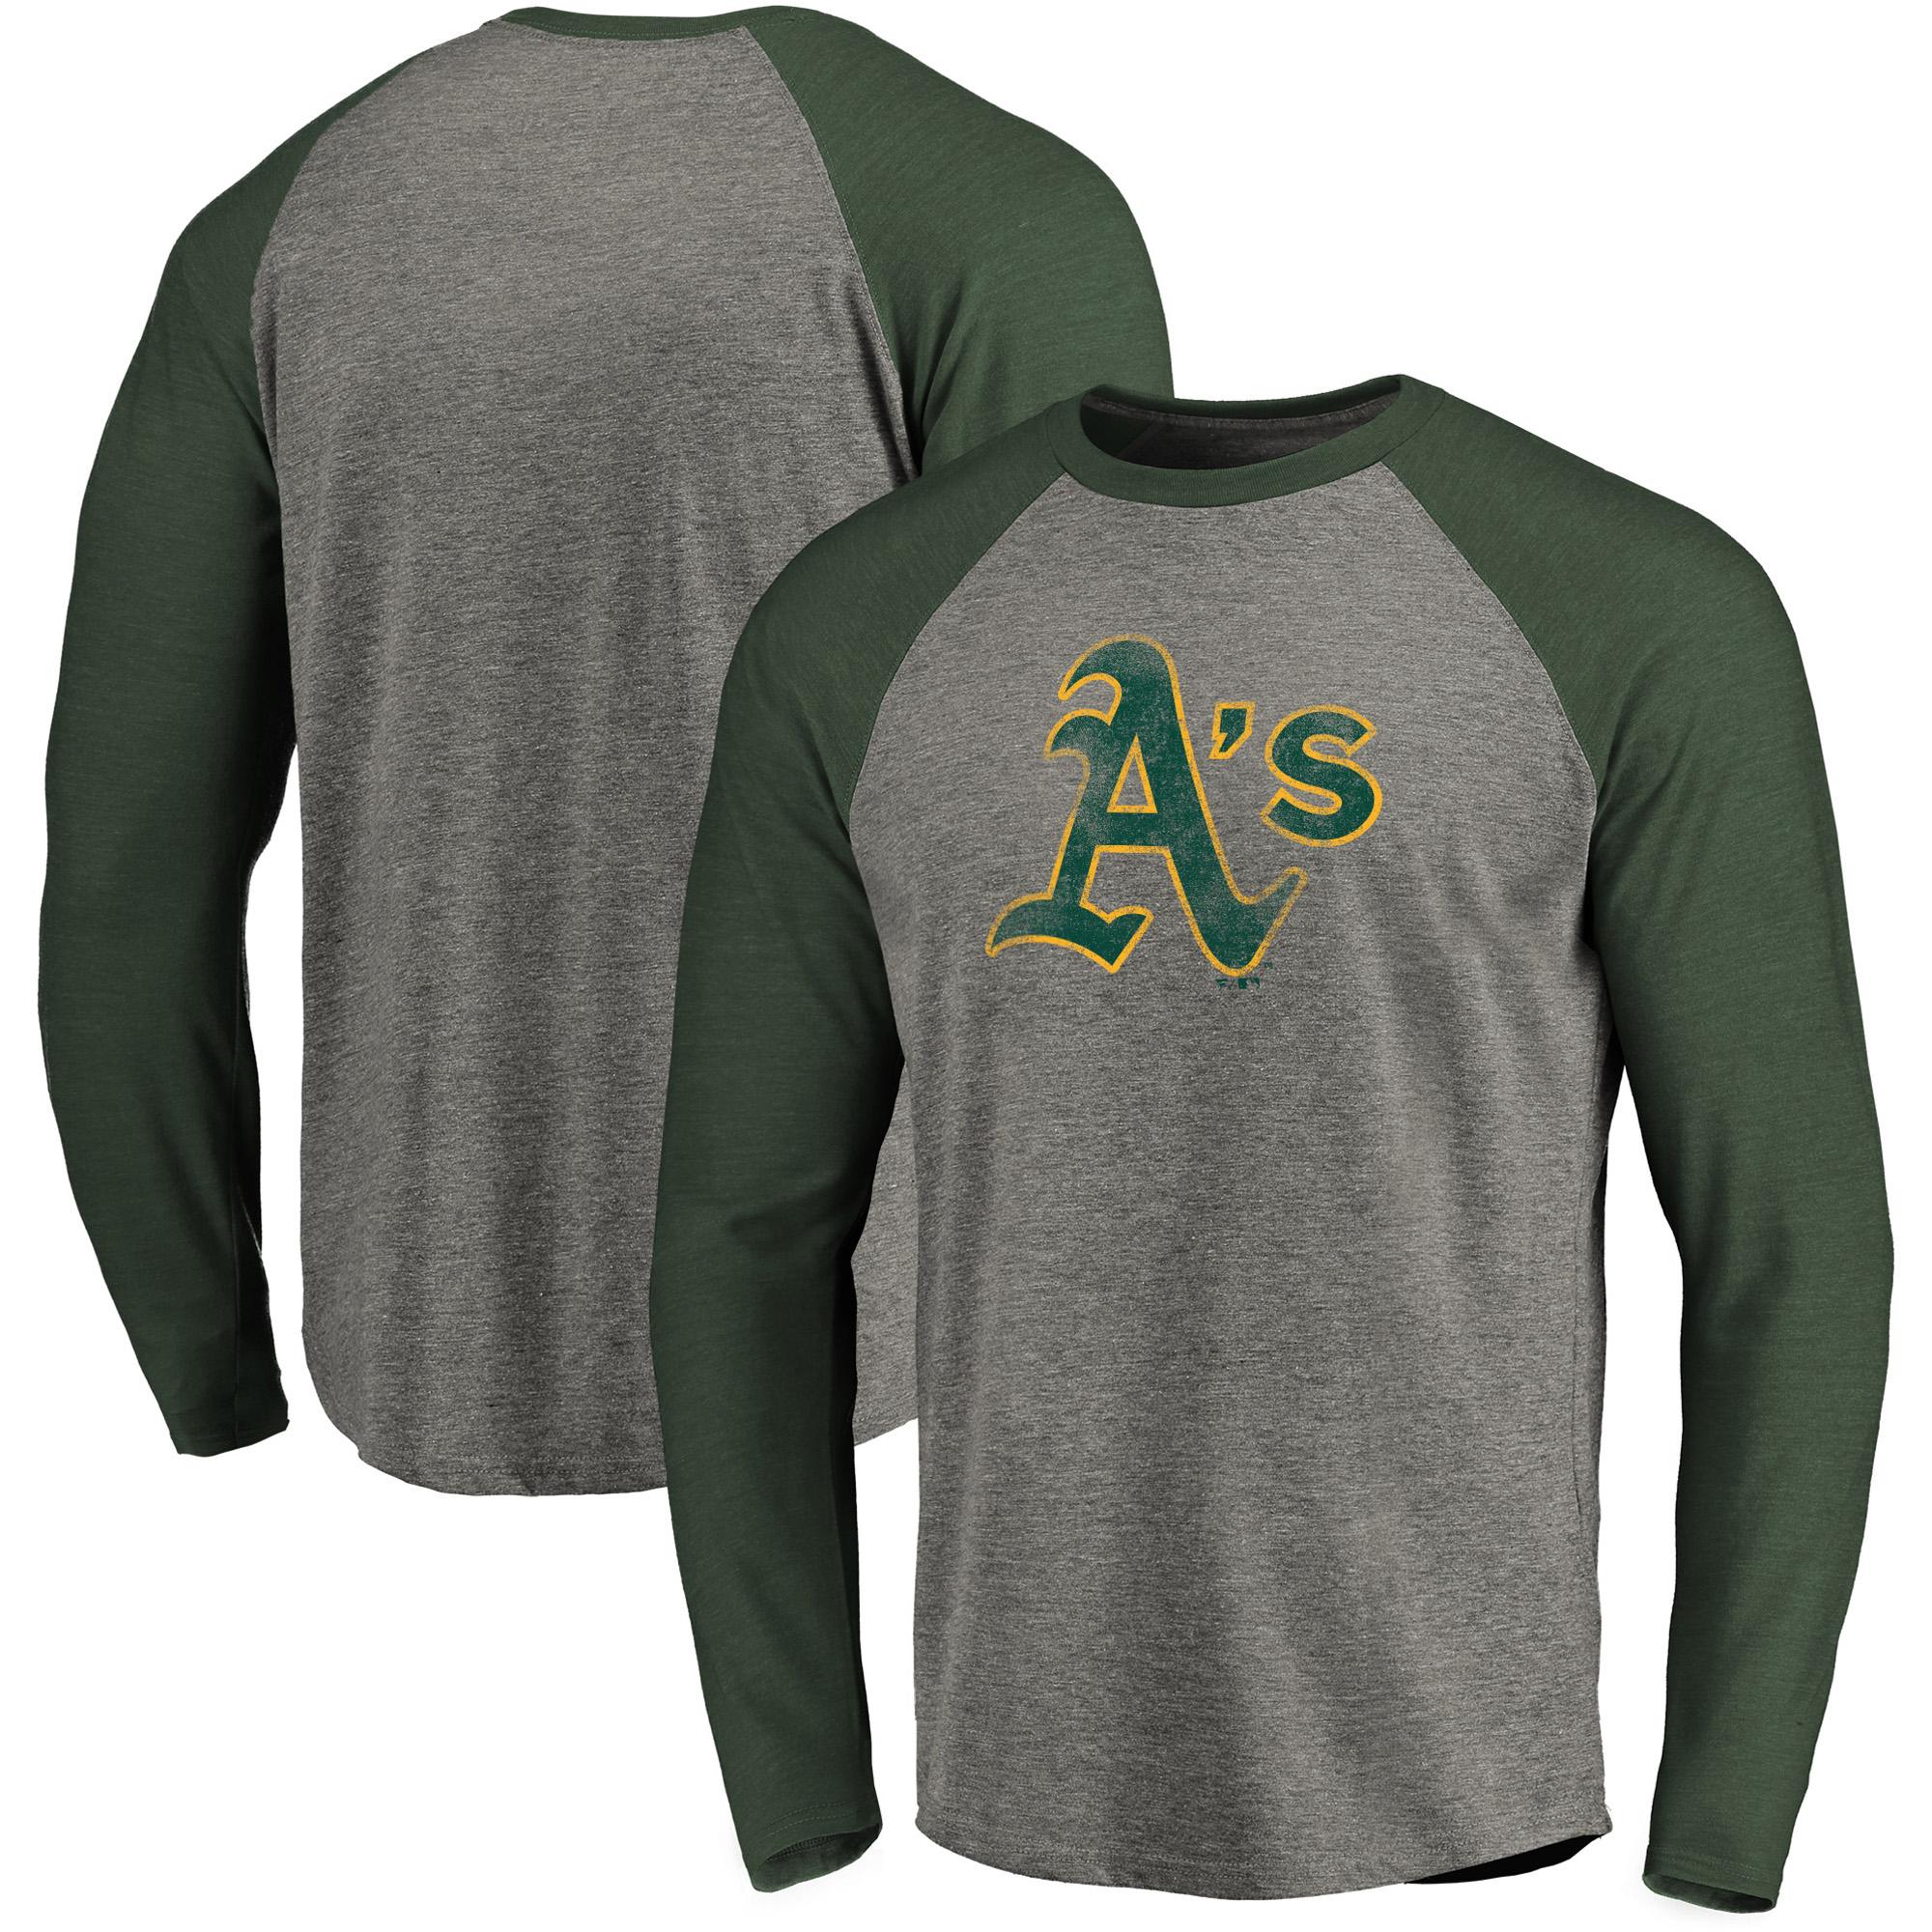 Oakland Athletics Fanatics Branded Distressed Team Raglan Tri-Blend Long Sleeve T-Shirt - Heathered Gray